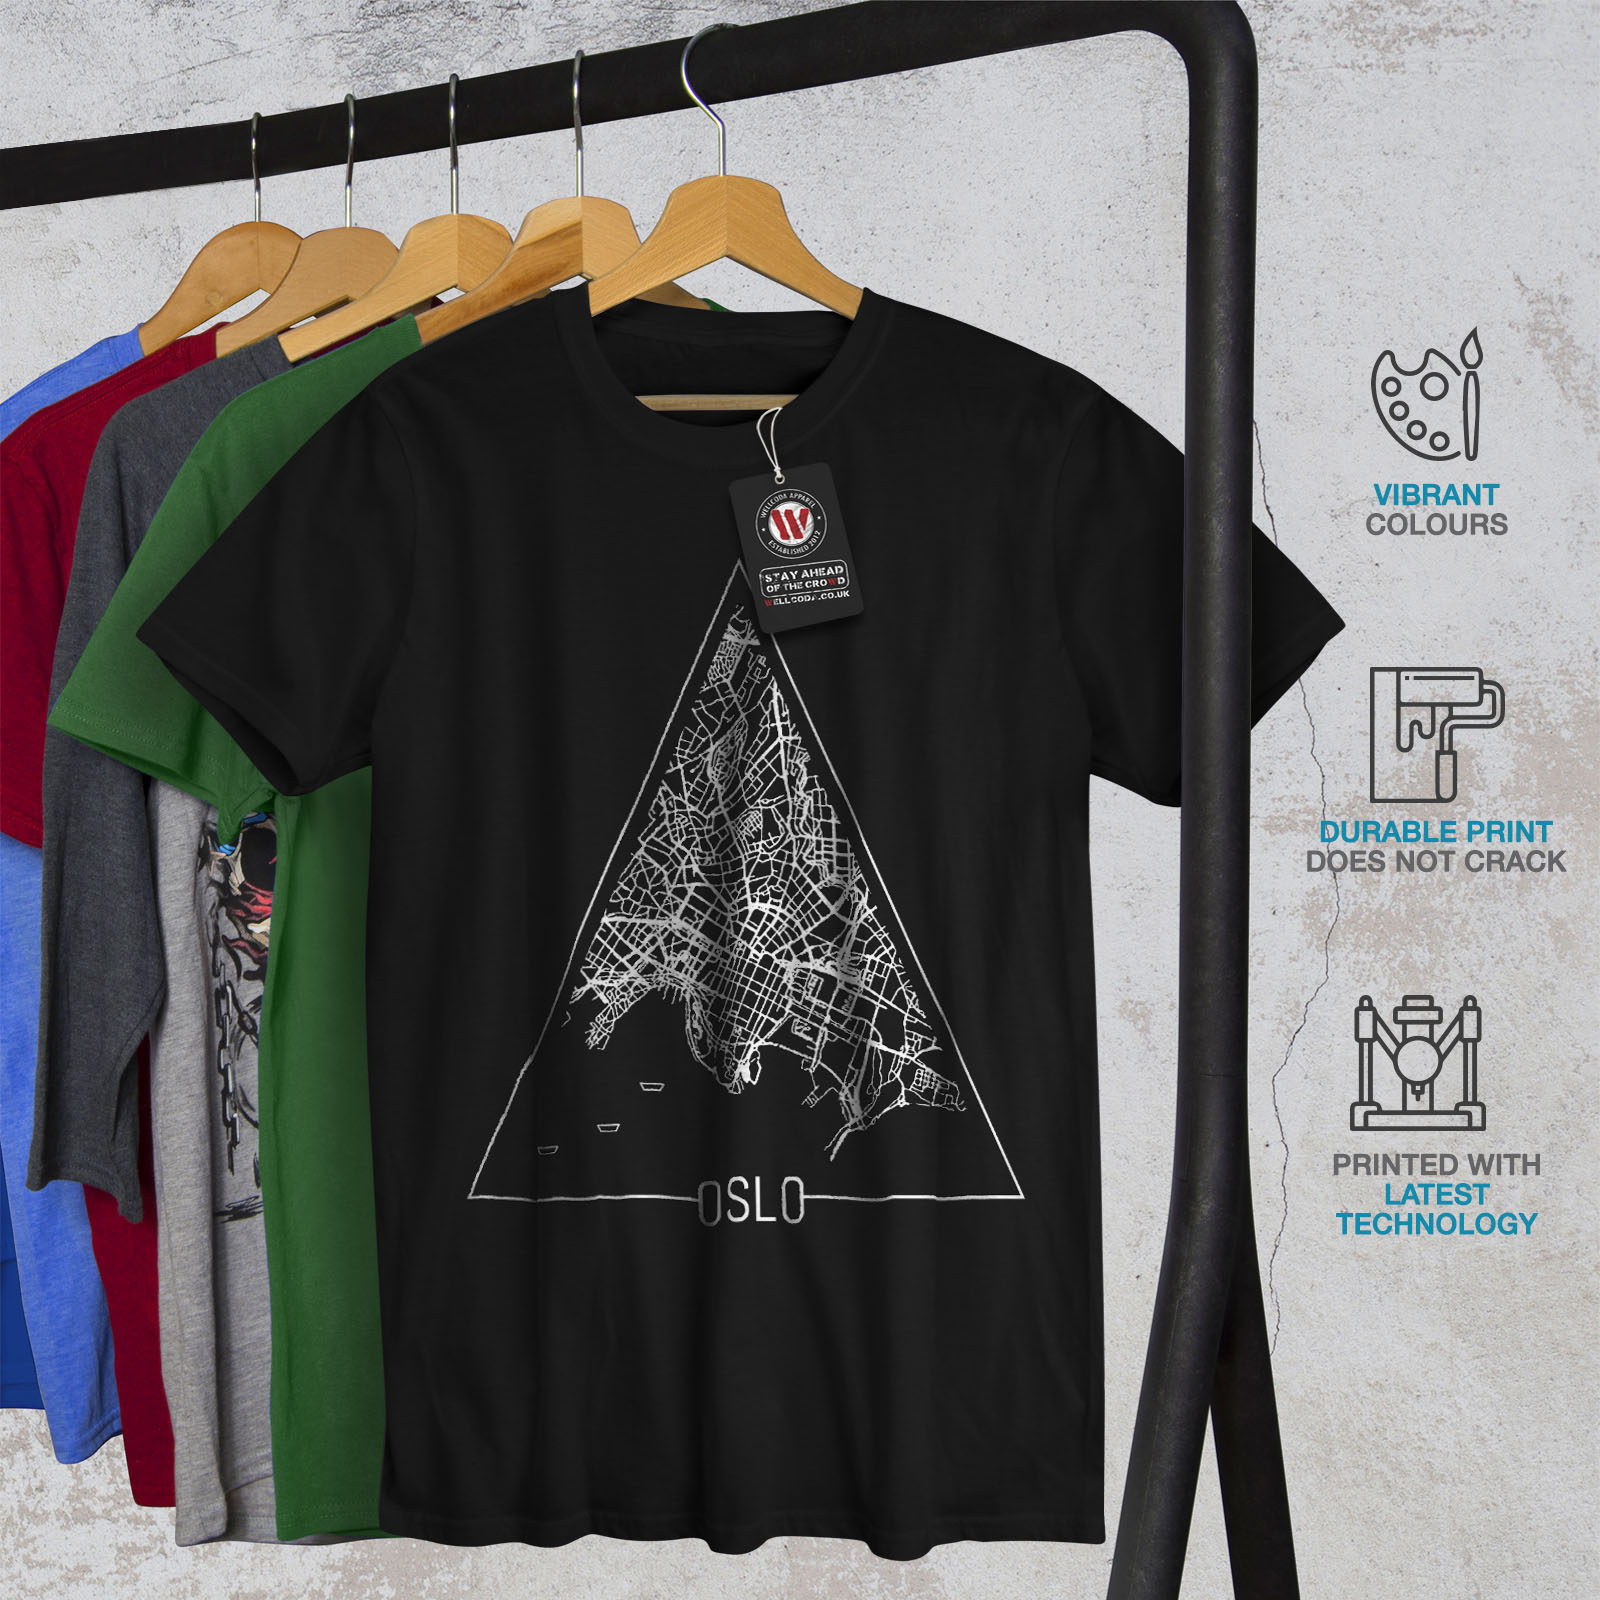 Wellcoda-Norvegia-Big-City-Oslo-da-uomo-T-shirt-Citta-design-grafico-stampato-T-shirt miniatura 6